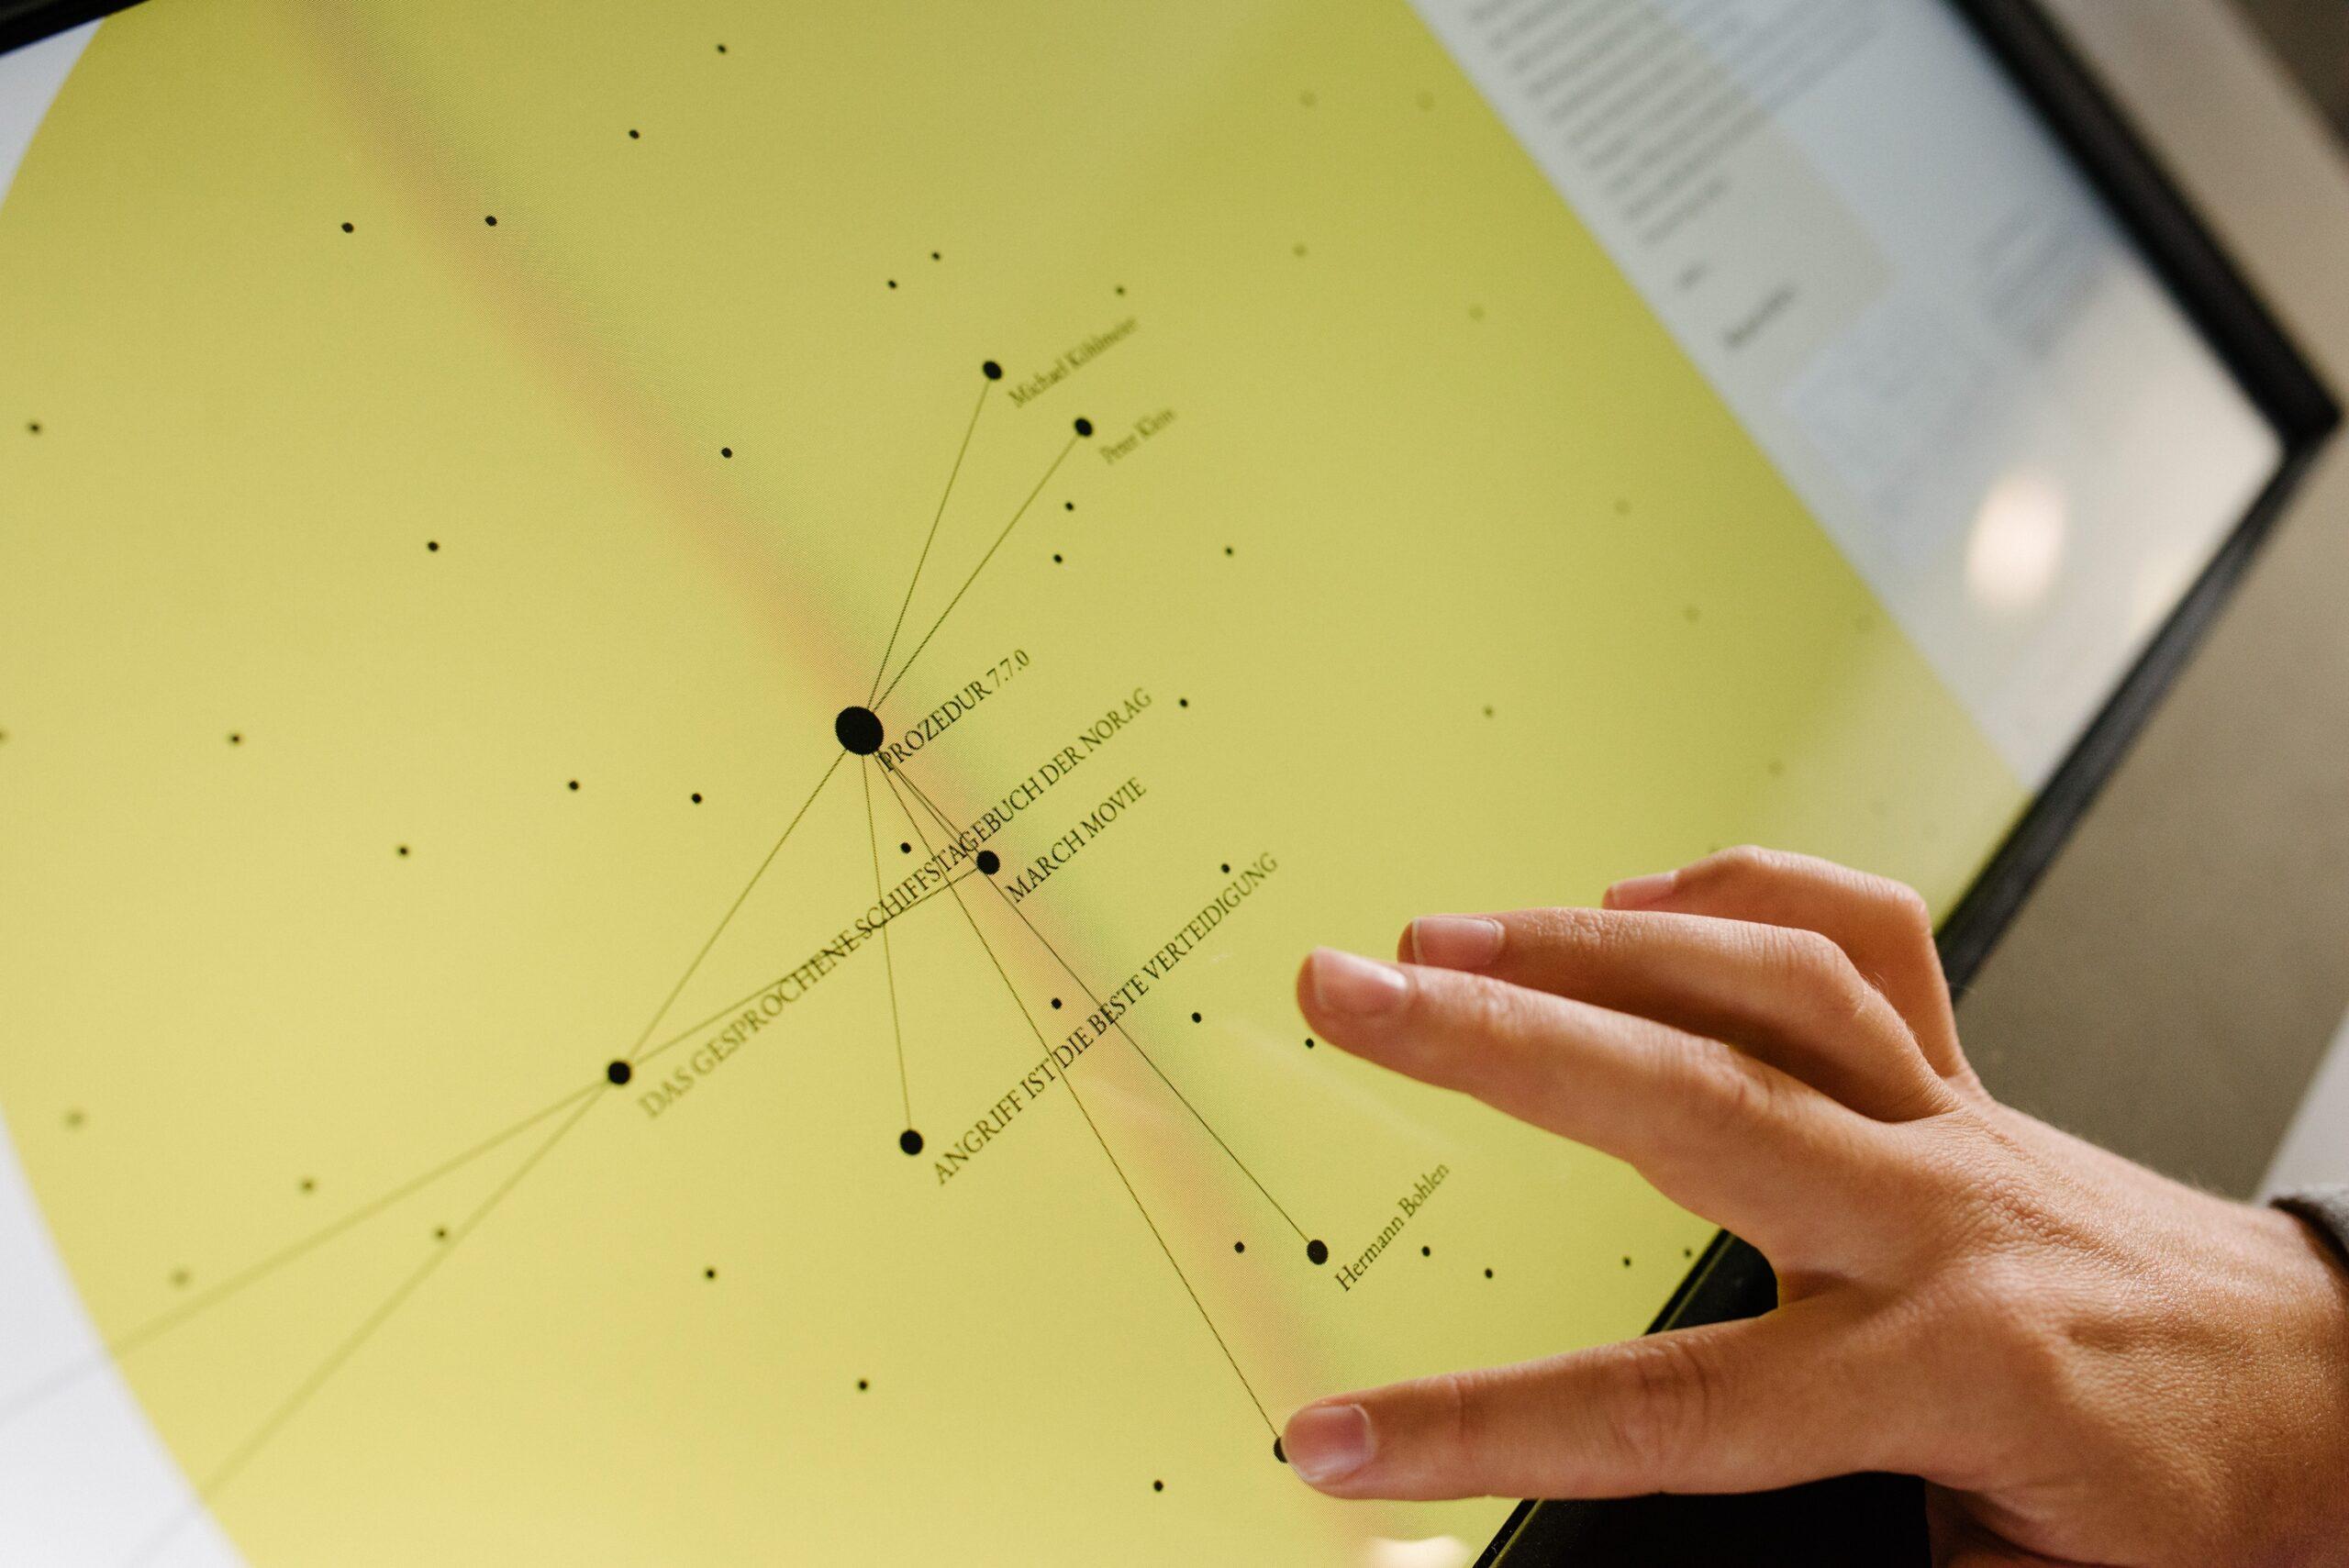 Radiophonic Spaces: audiovisuelle Plattform »Mindmap zur Radiokunst« - DESIGNBOTE